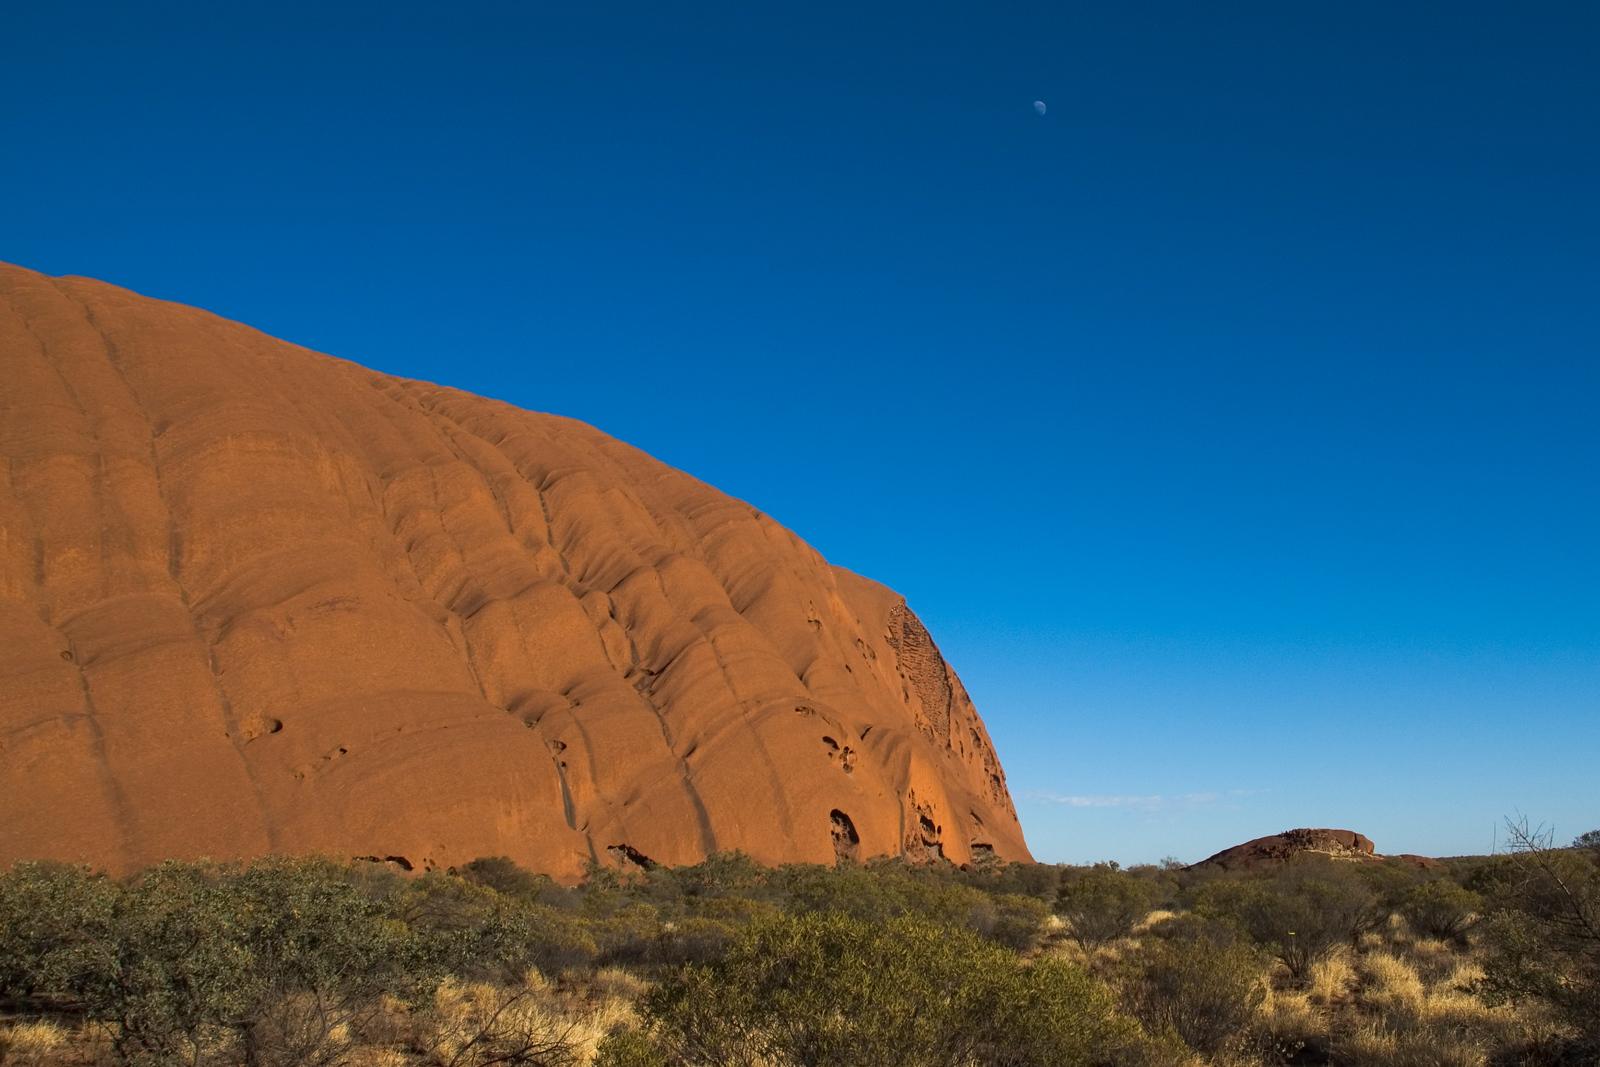 Uluru-Kata Tjuta National Park - UNESCO World Heritage Site